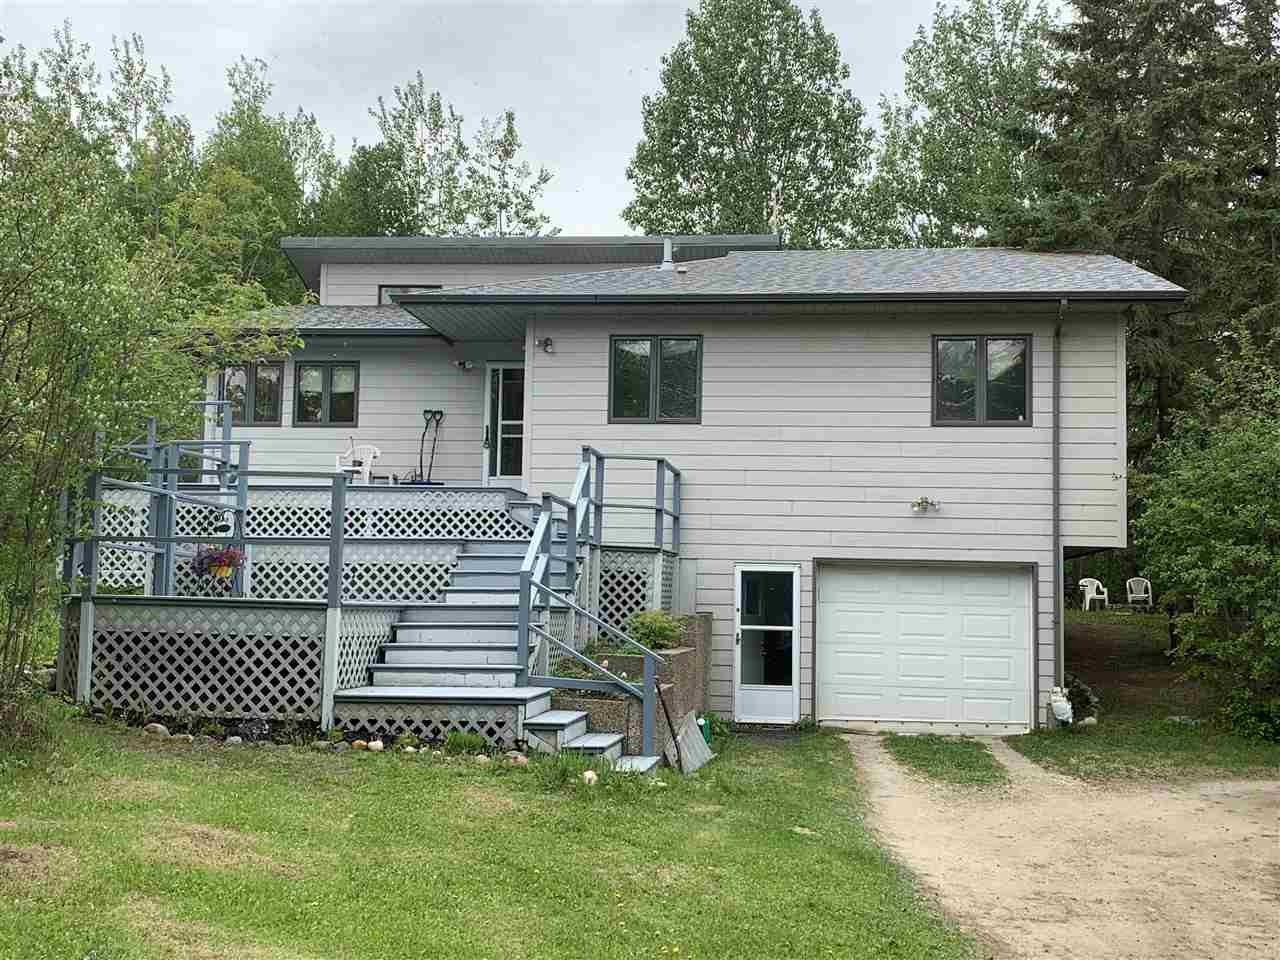 Main Photo: 4923 56 Avenue: Rural Lac Ste. Anne County House for sale : MLS®# E4199634